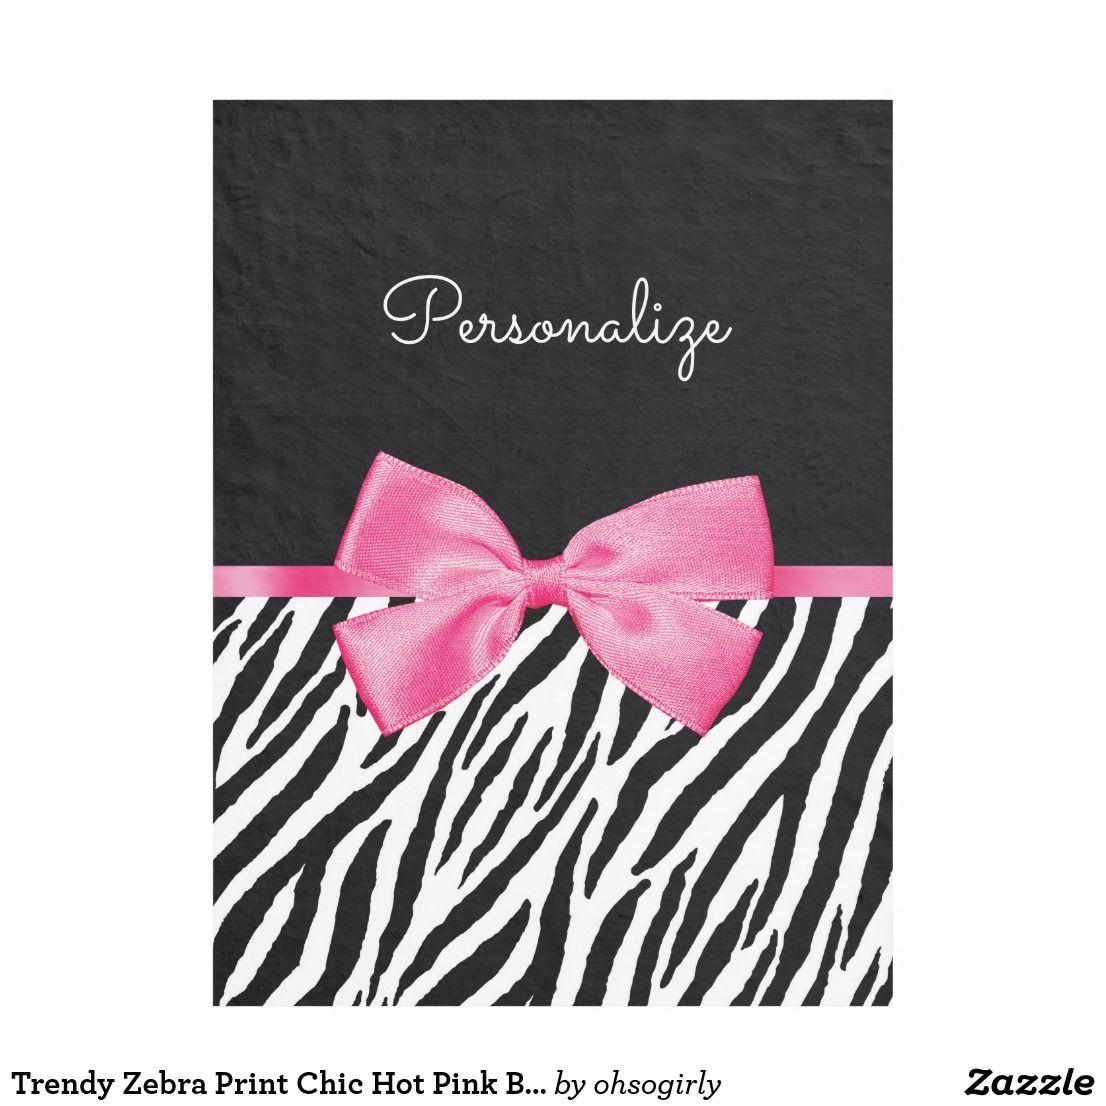 Trendy zebra print chic hot pink bow and name fleece blanket